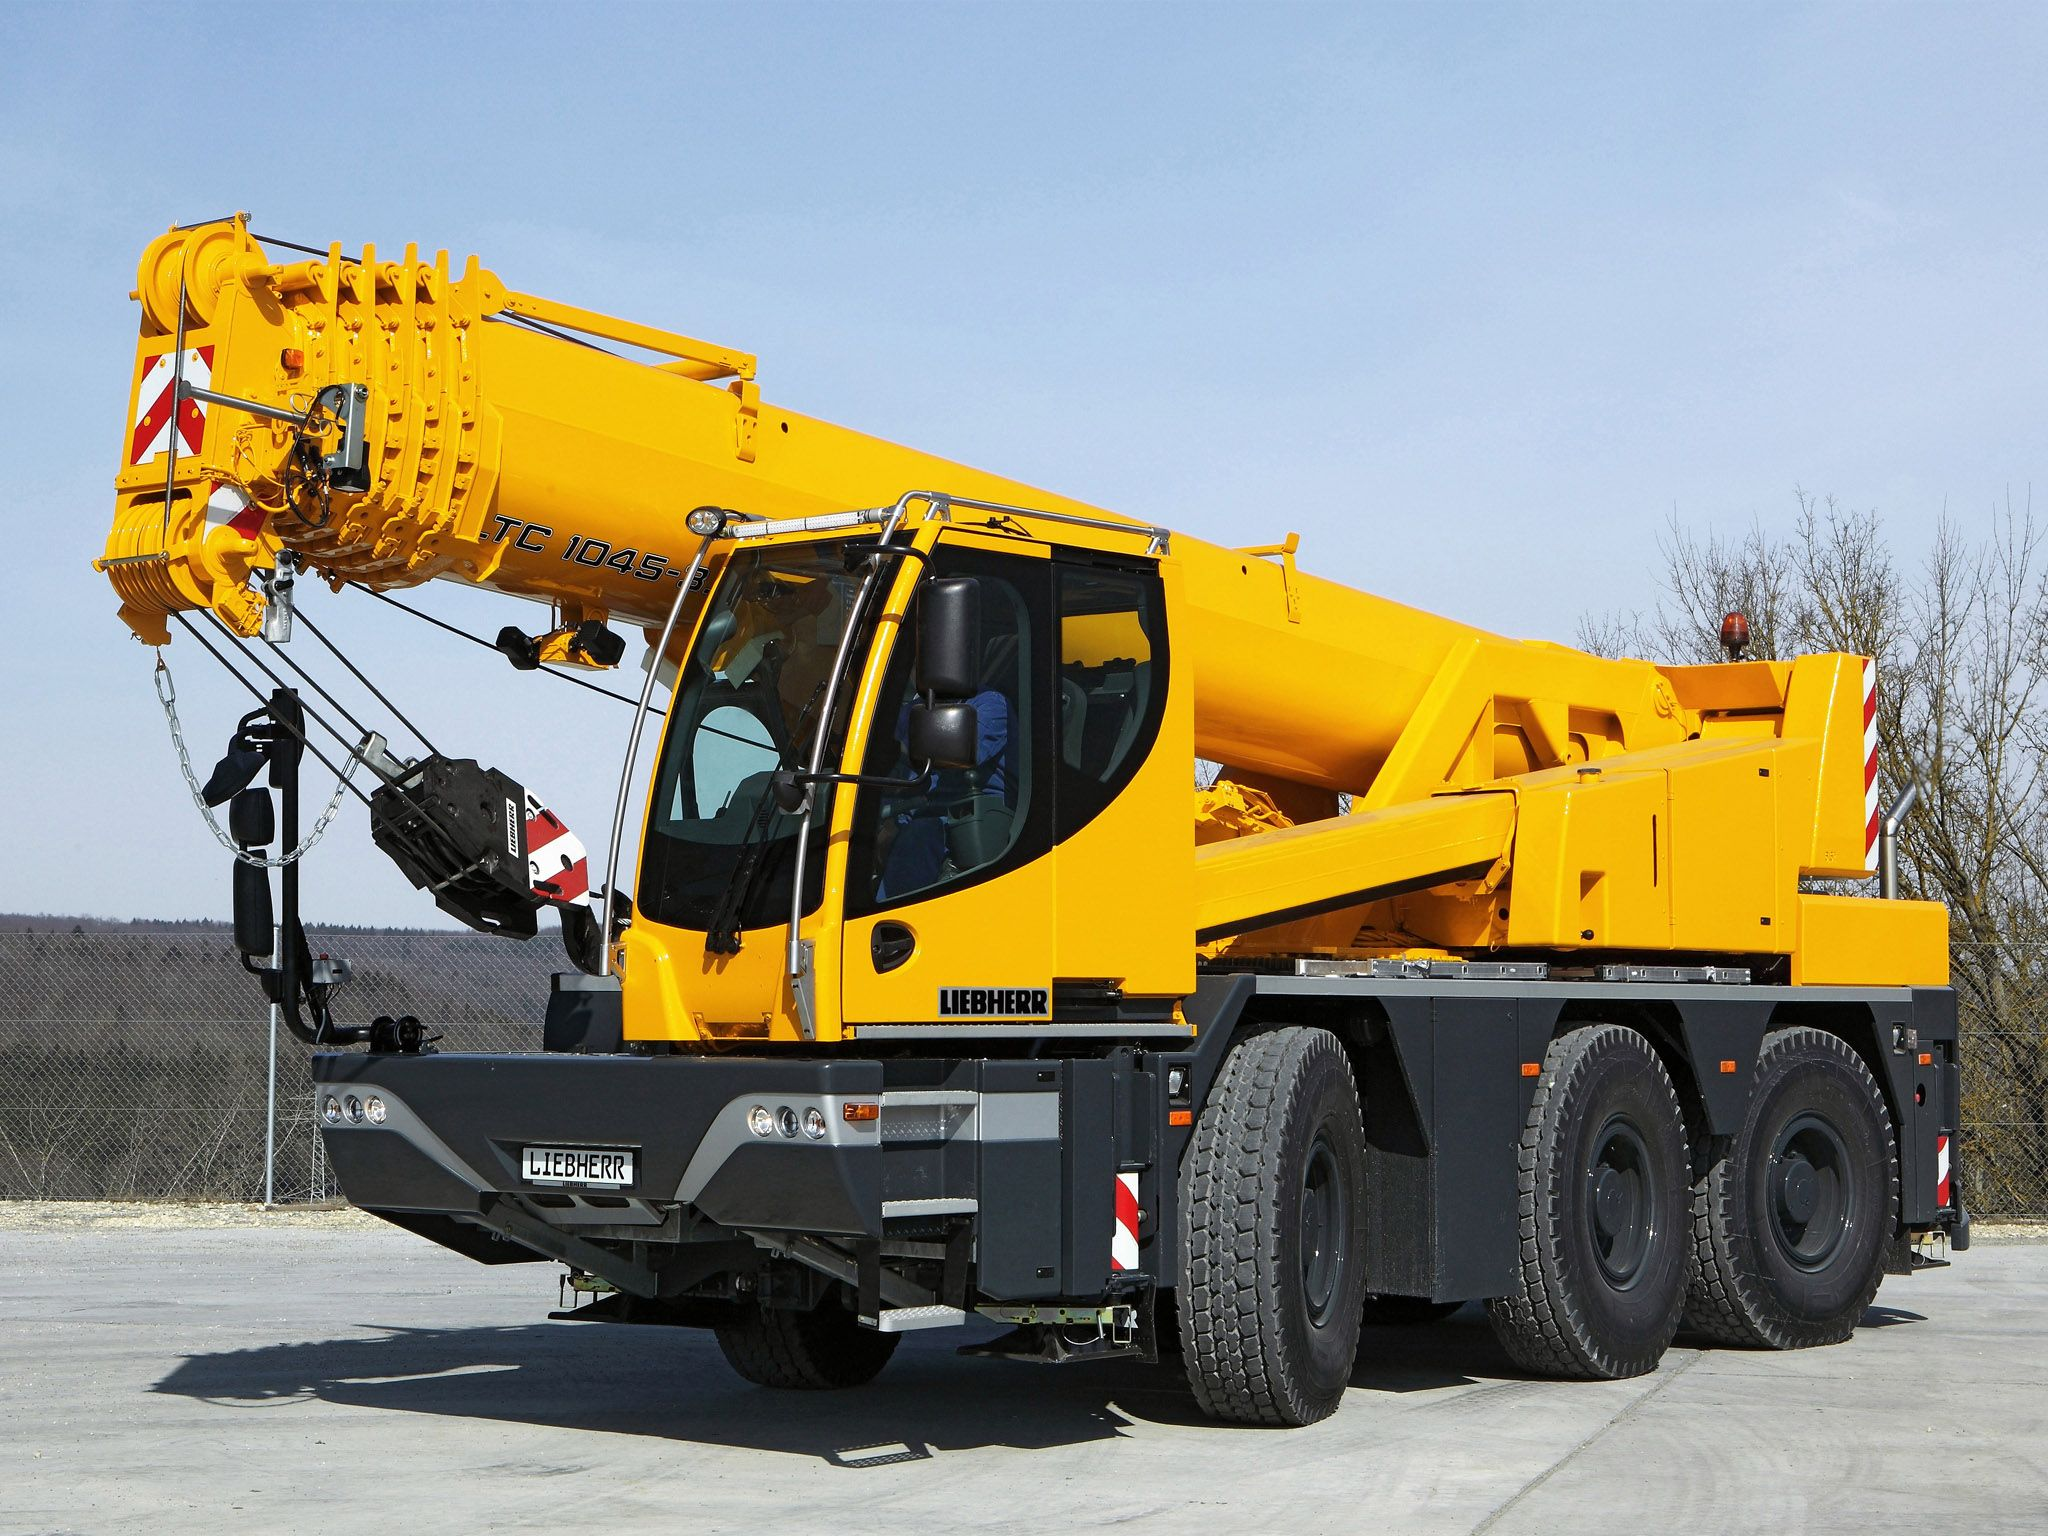 Liebherr Mobile Crane Equipment Pinterest Heavy